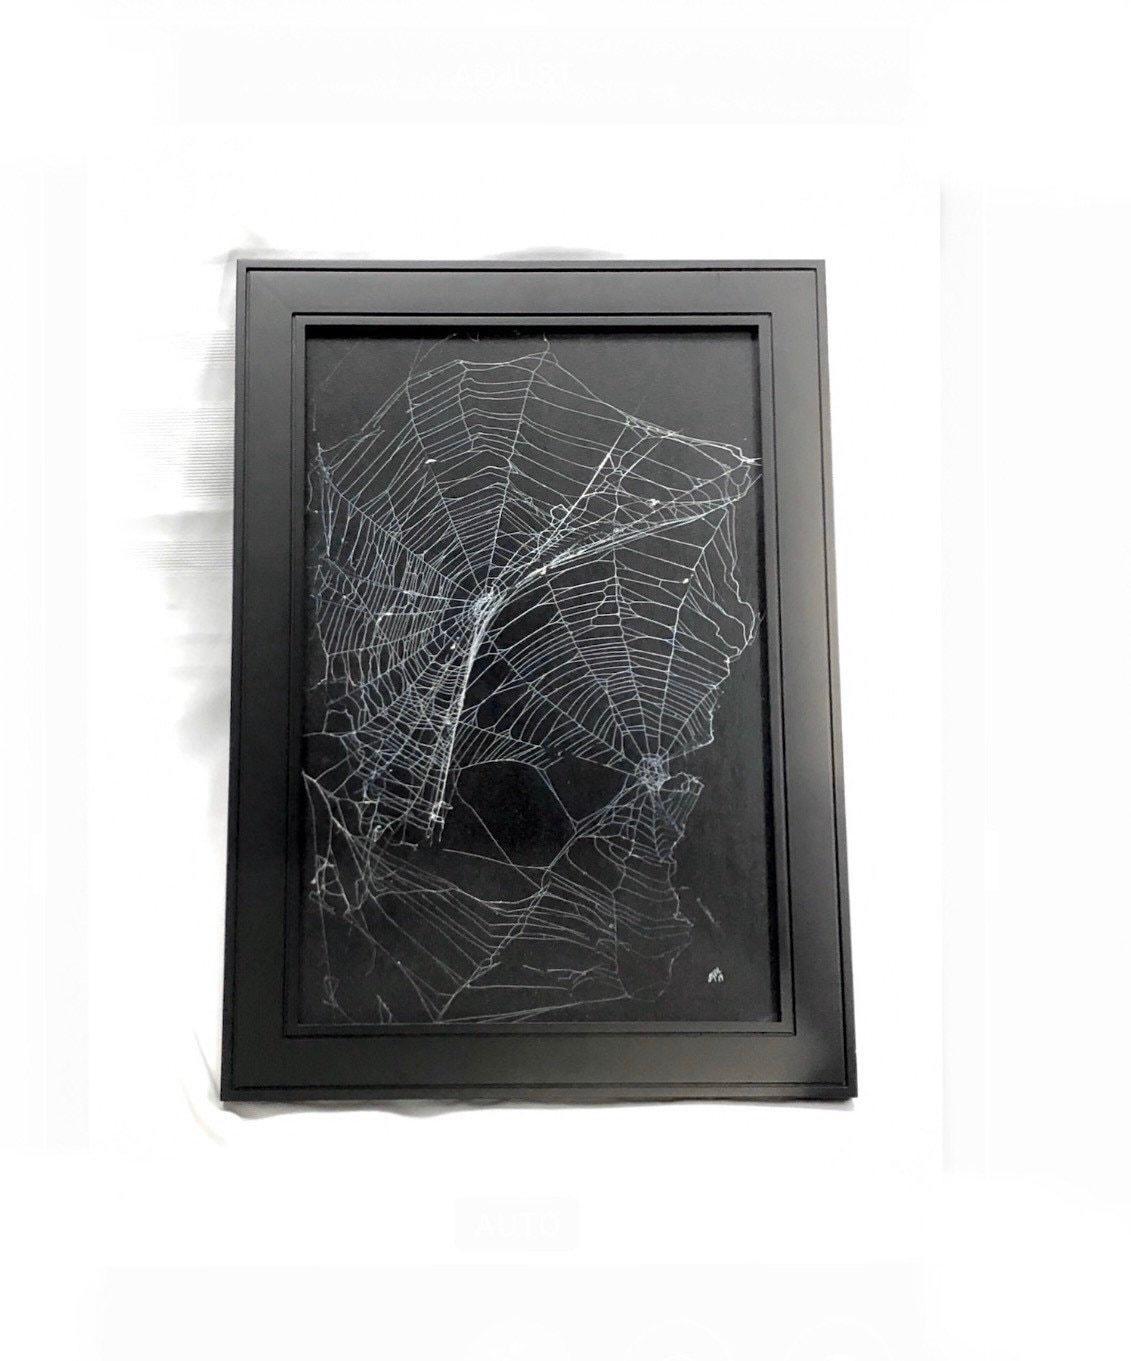 Real Spider Web Preserved Spider Web Framed Spider Web Spider Web Art Spider Taxidermy Real Nature Decor Gothic Home Decor Dark Art